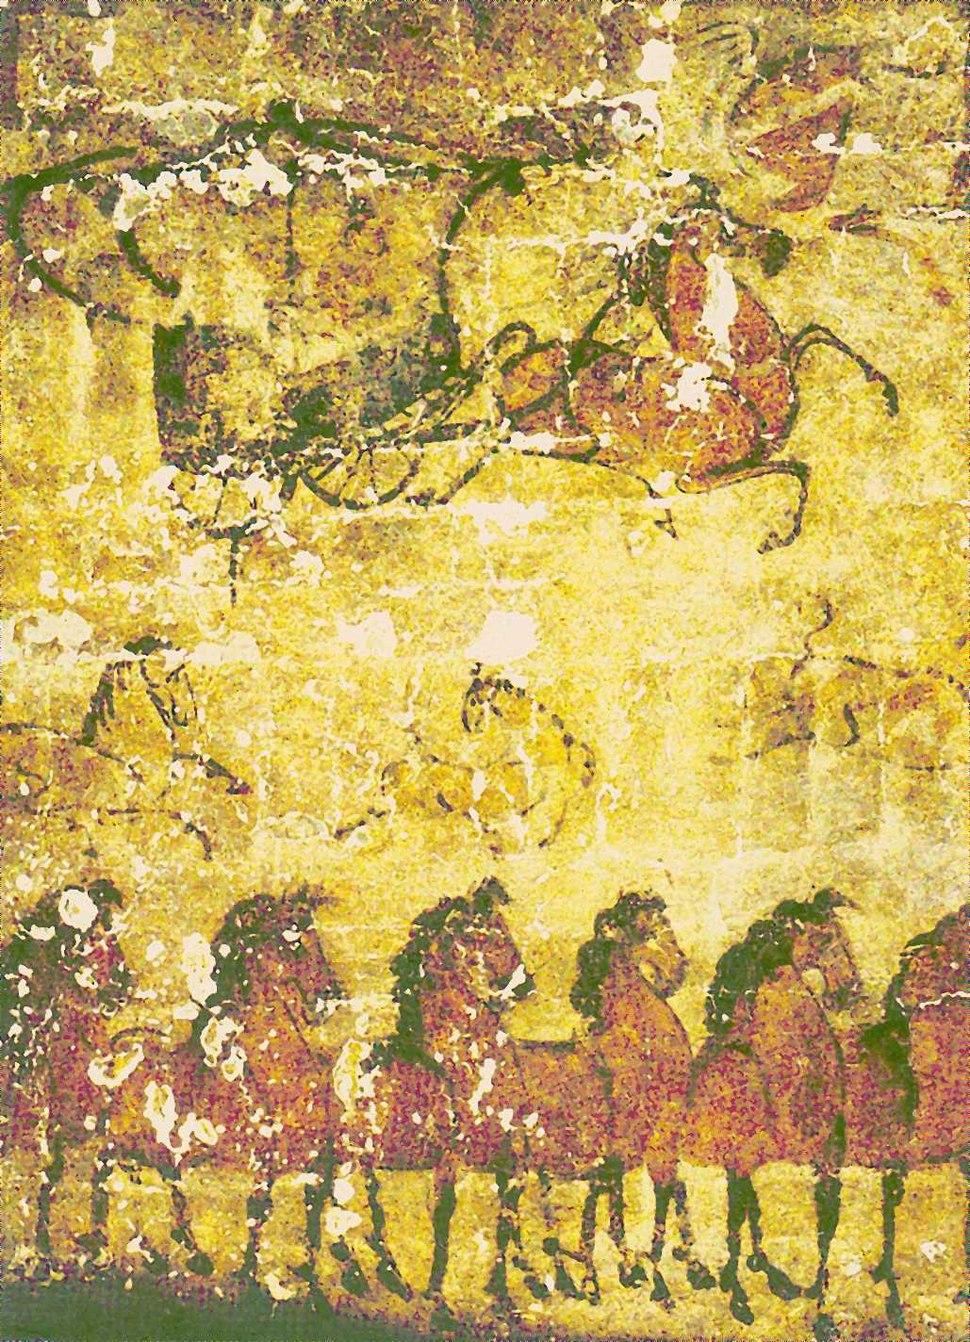 Han Tomb Mural, Horses and Carts